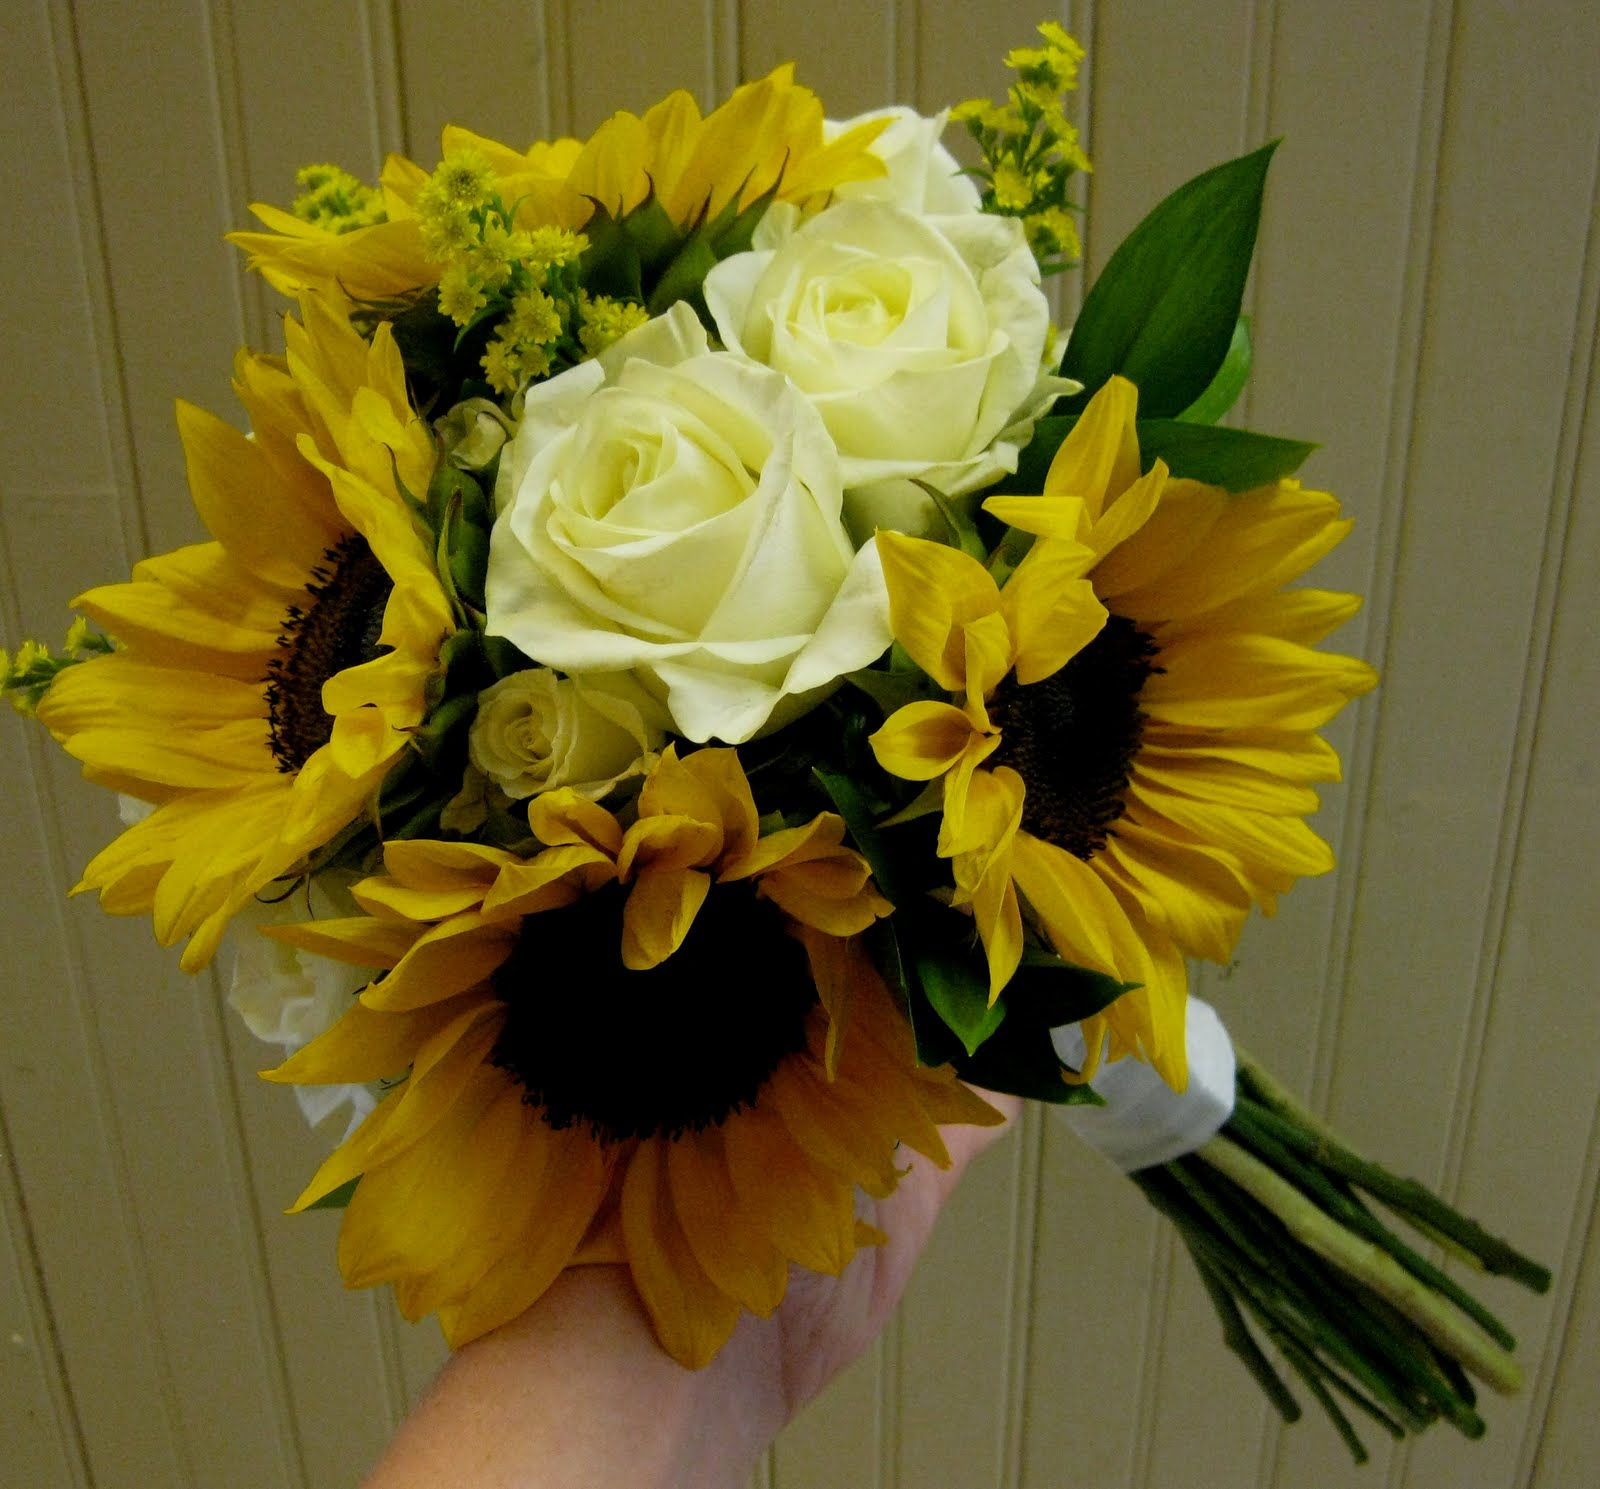 Sunflower Wedding Bouquet Ideas: Goegebeur's Blog: Wedding Bouquet Sunflowers